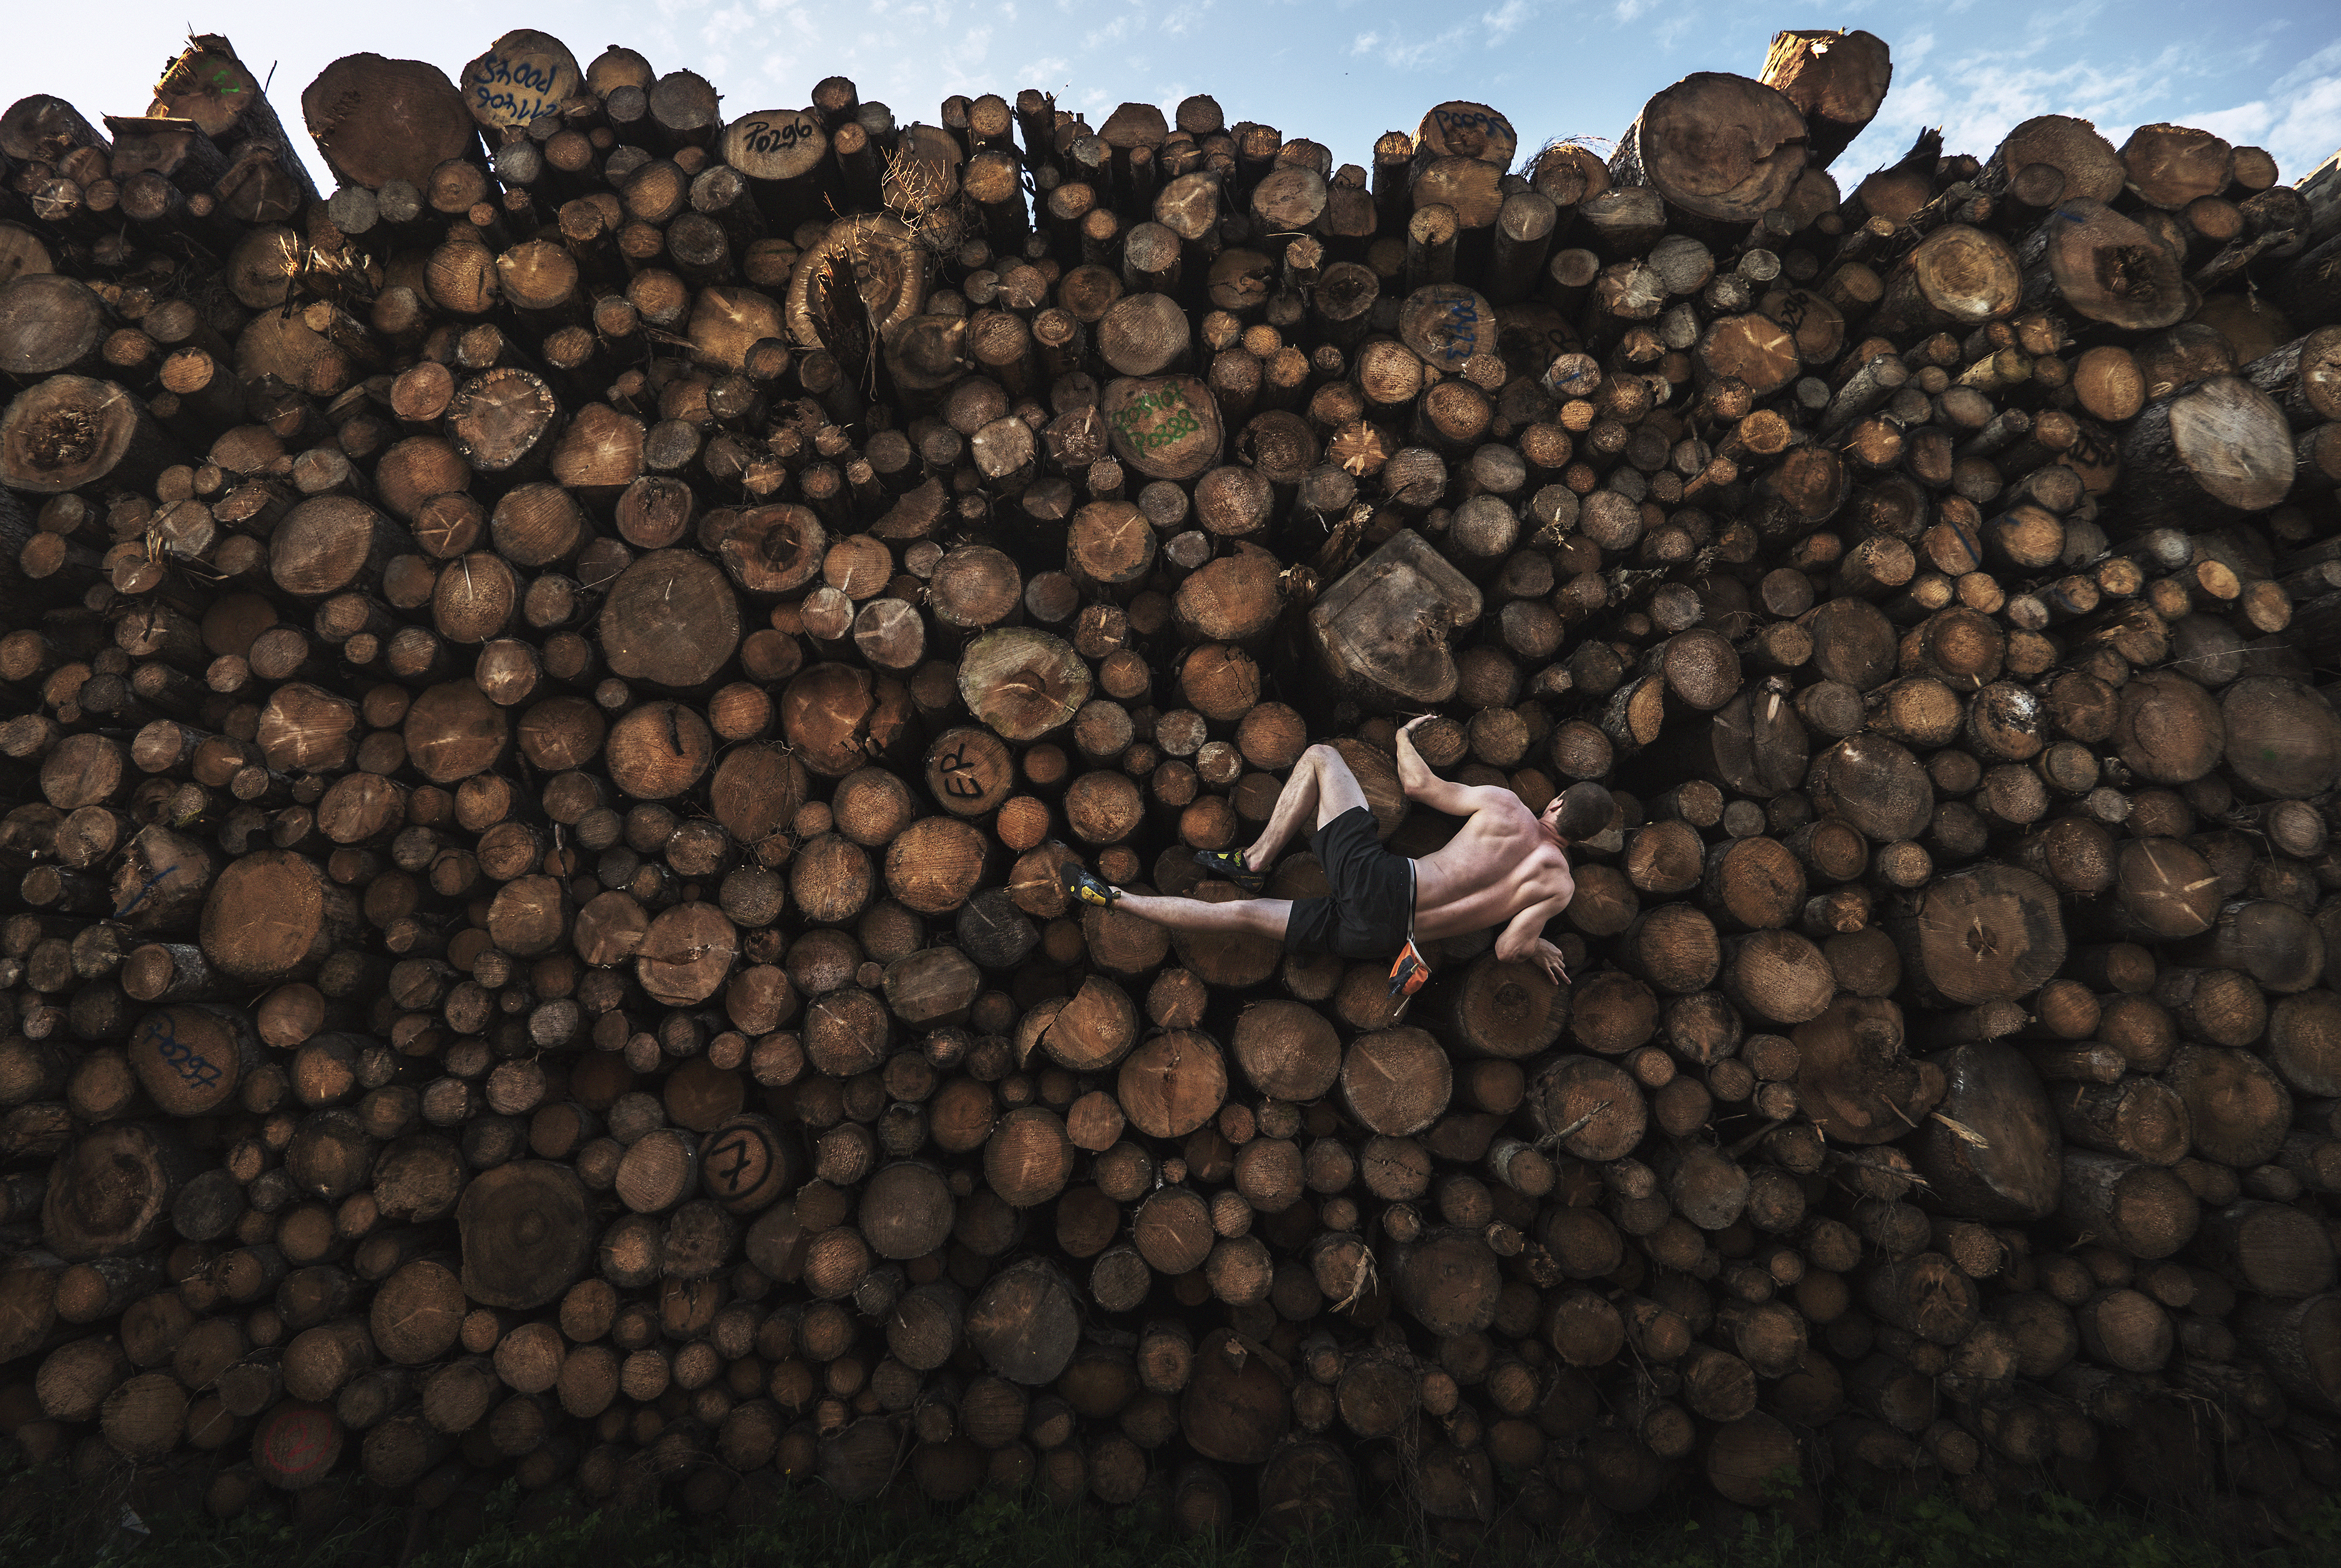 Log Pile Bouldering, Adam Pretty, Getty Images